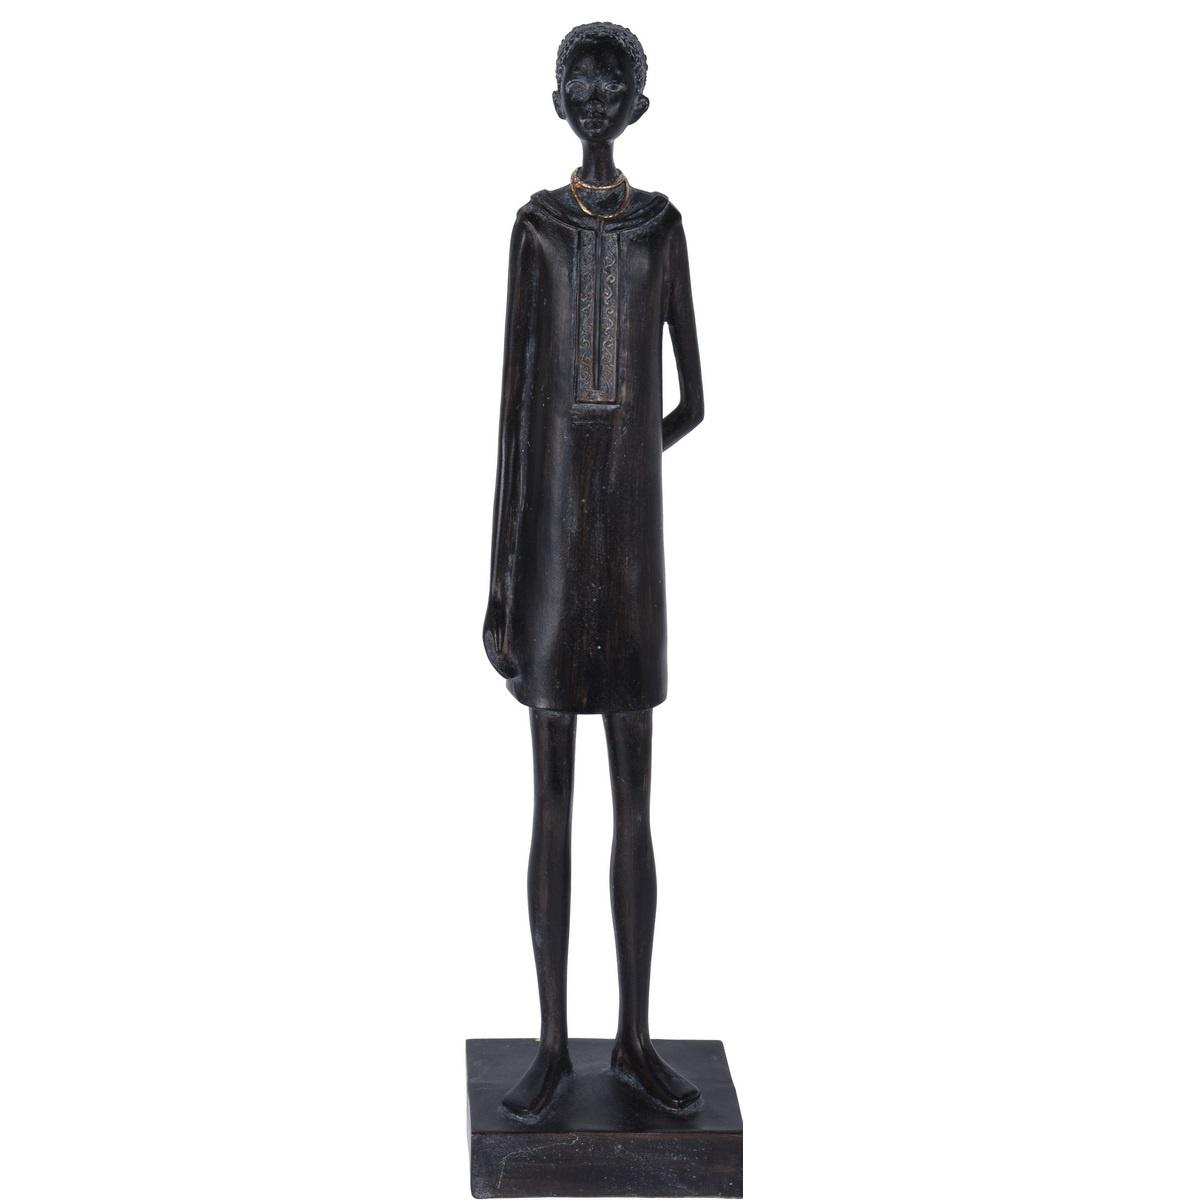 Koopman Dekorativní soška African woman, 40 cm